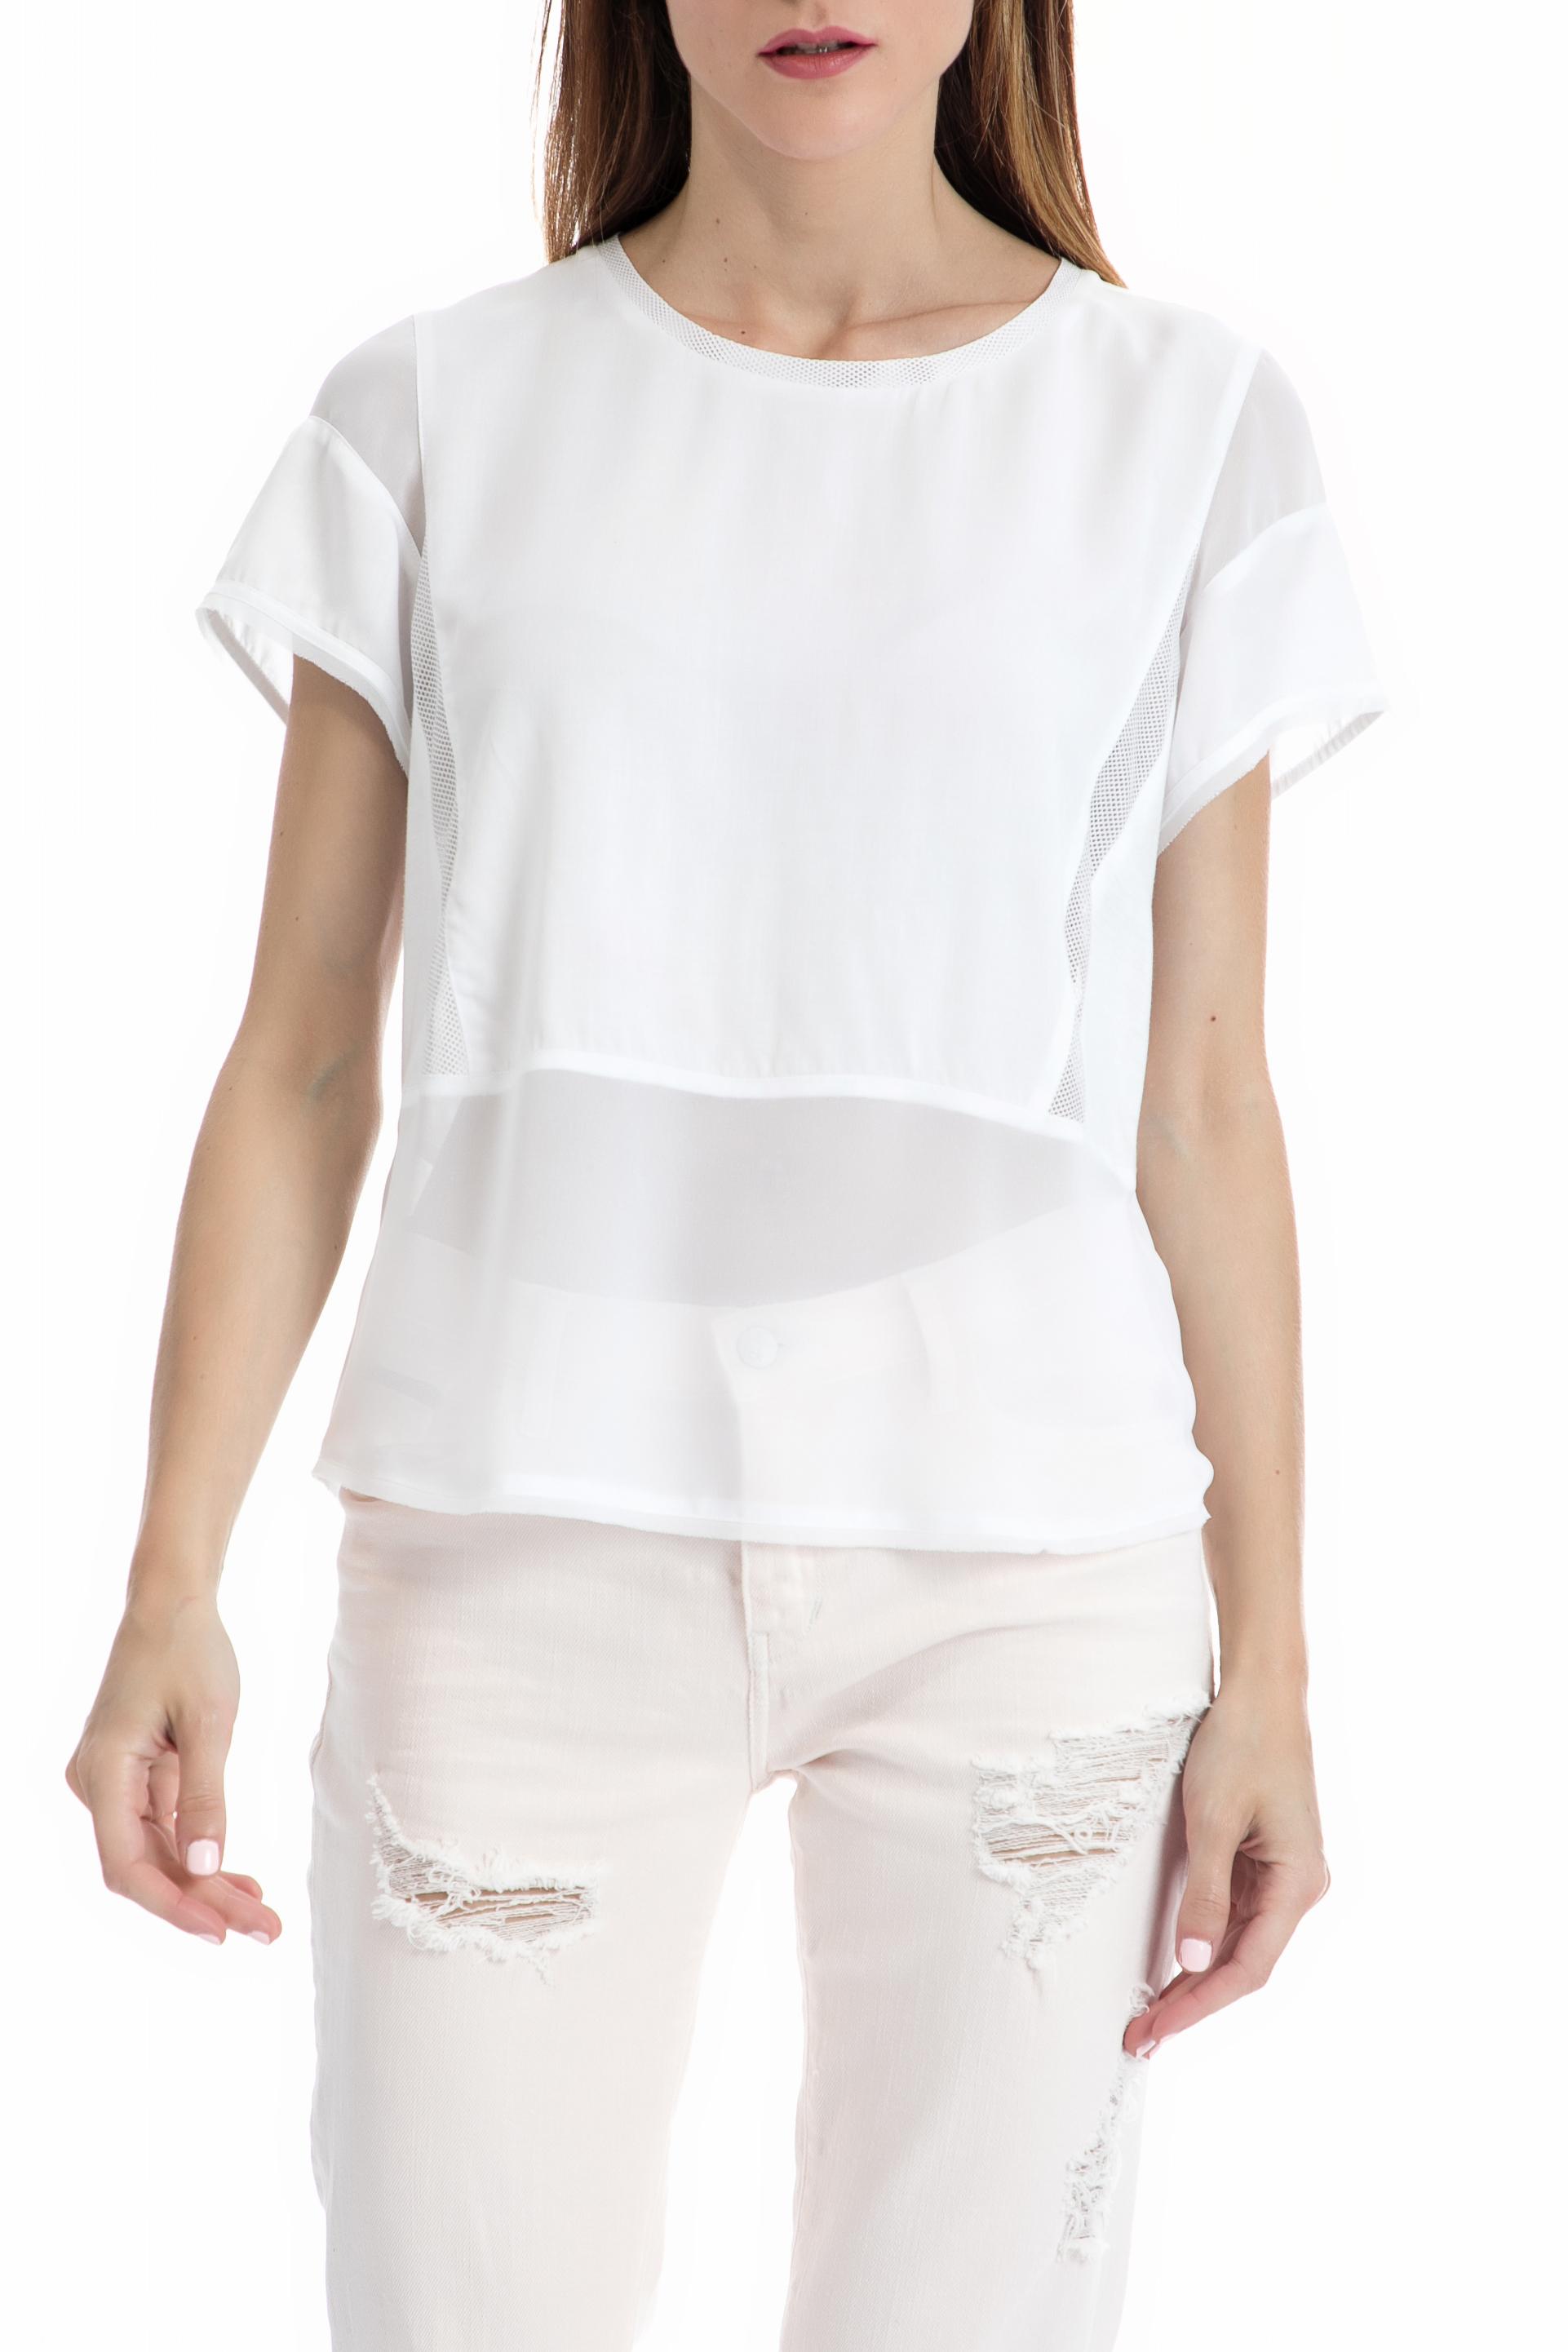 430b7bf56ccd CollectiveOnline CALVIN KLEIN JEANS - Γυναικεία μπλούζα CALVIN KLEIN JEANS  λευκή